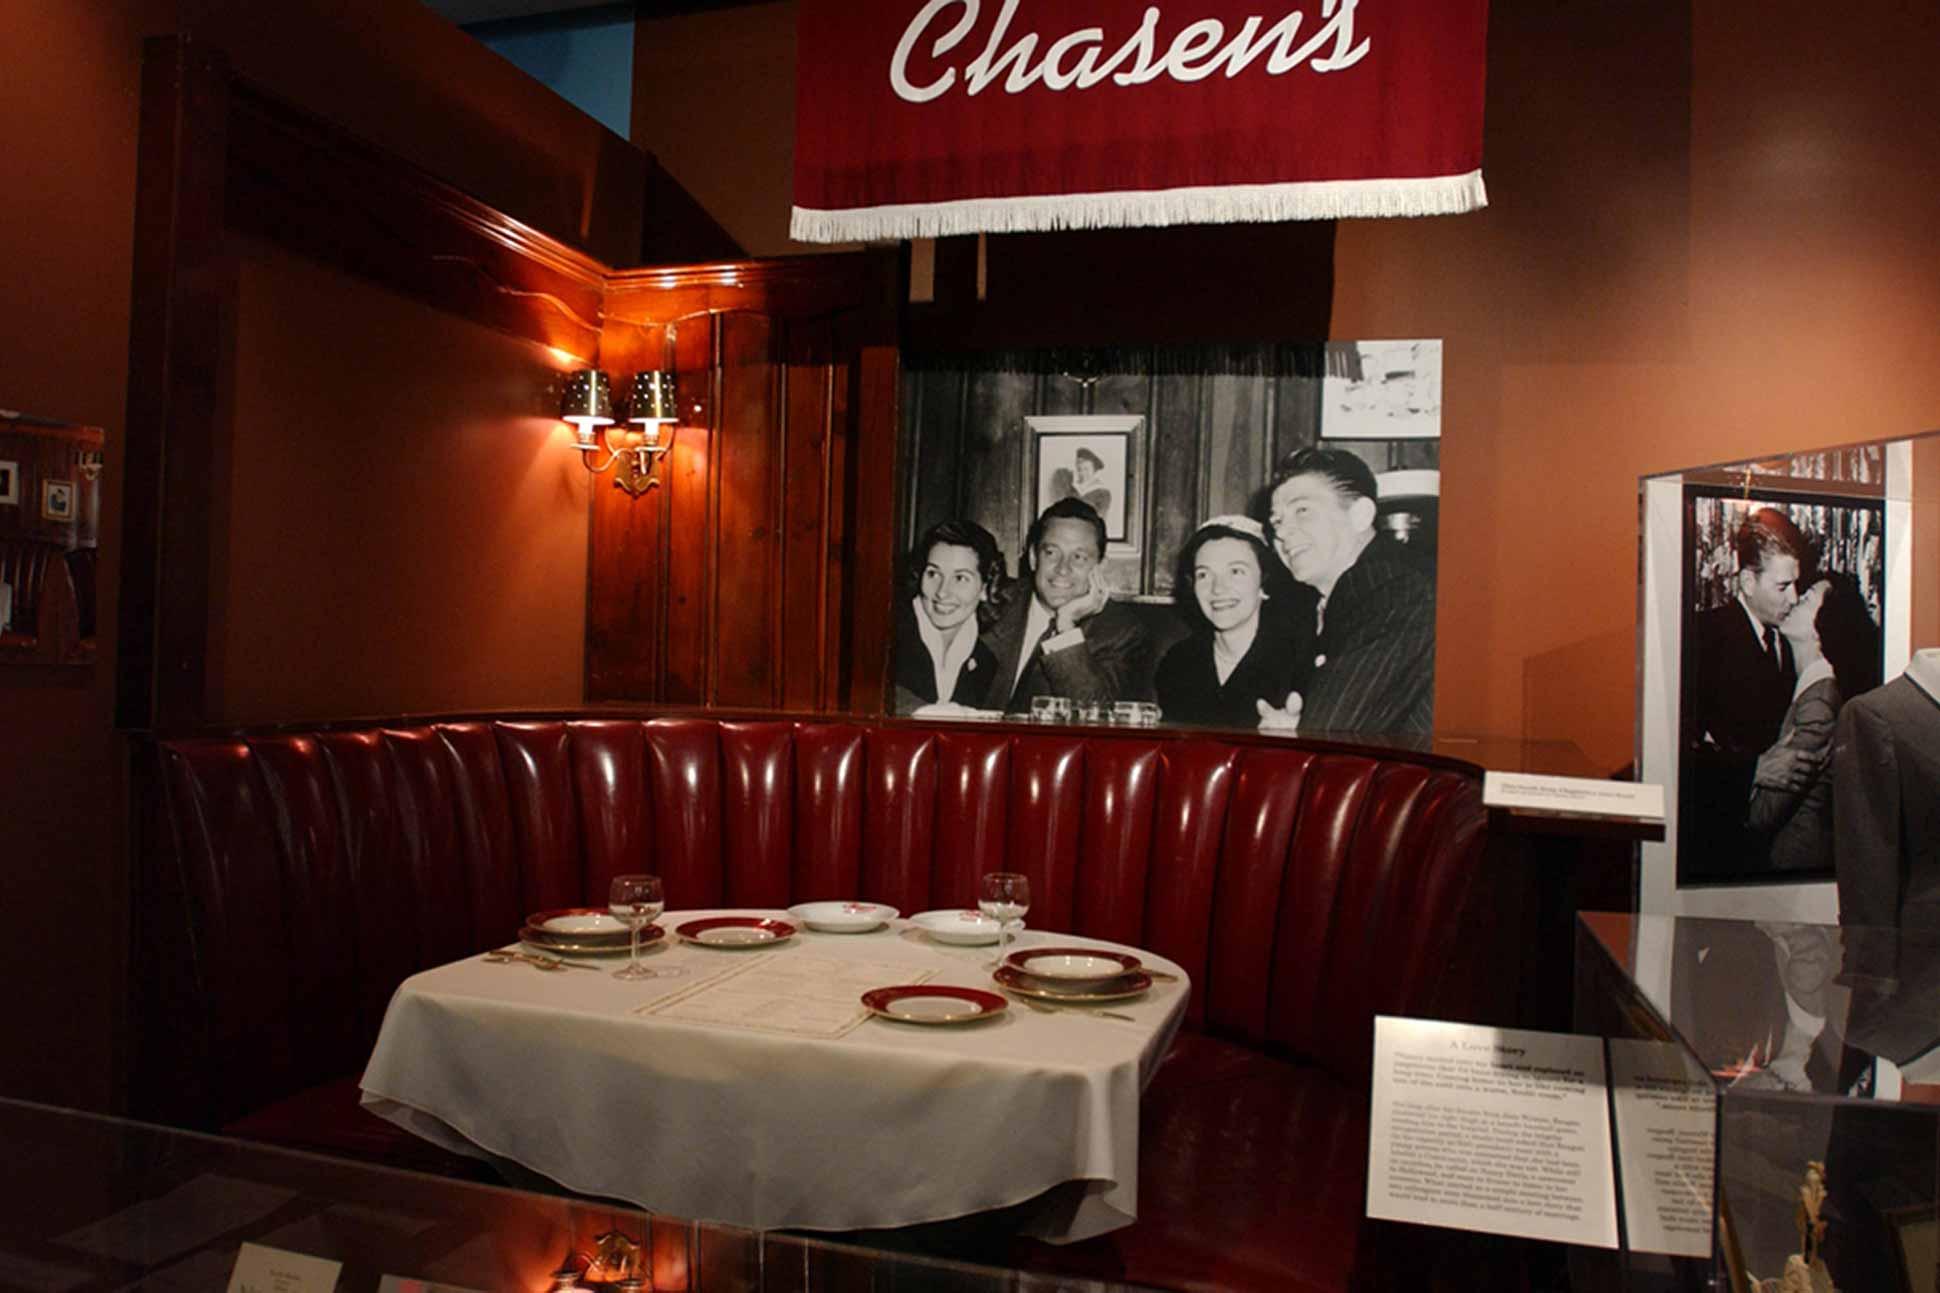 10 Best Hollywood Restaurants (Los Angeles) - TripAdvisor